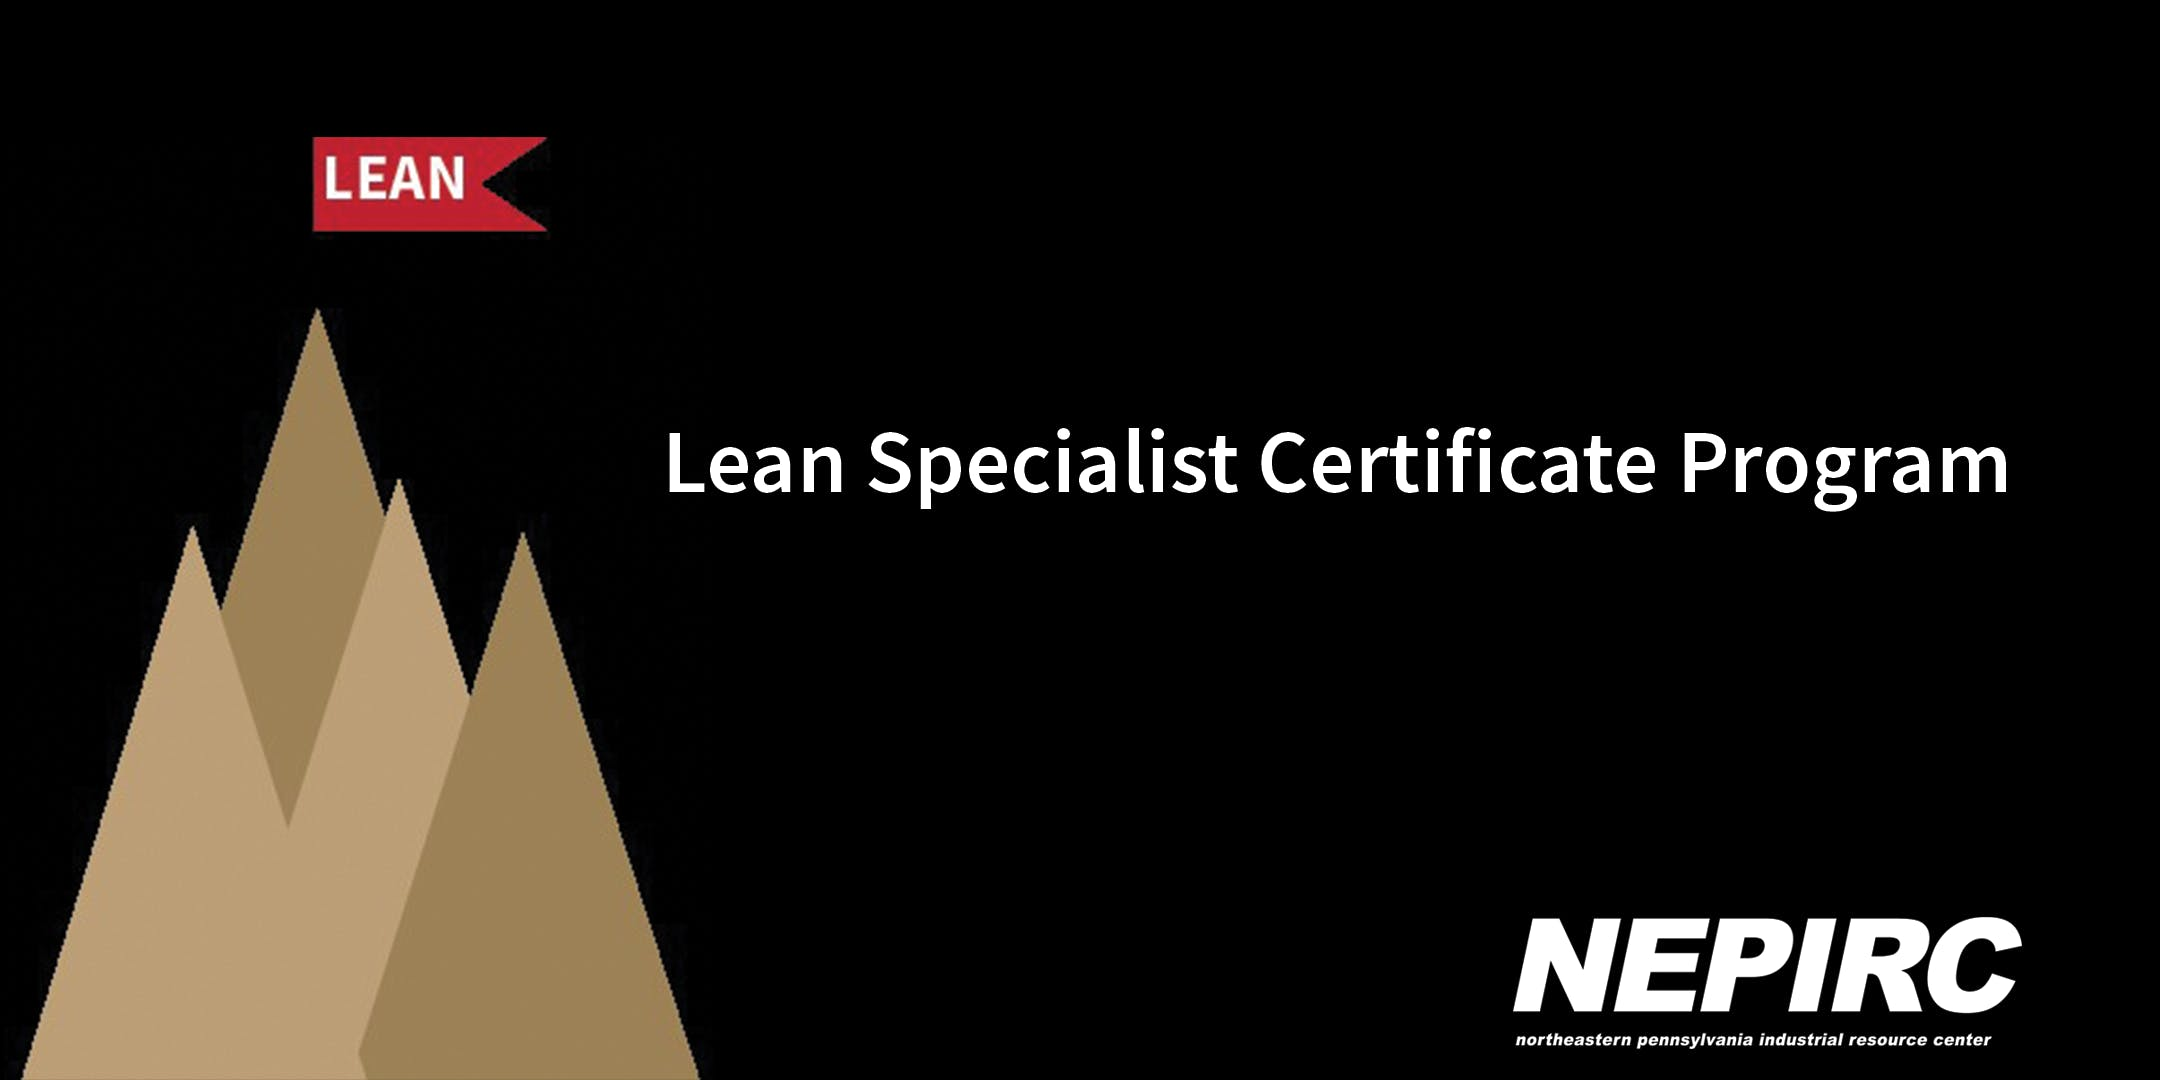 Lean Specialist Certificate Program Nepirc Mondays August 27